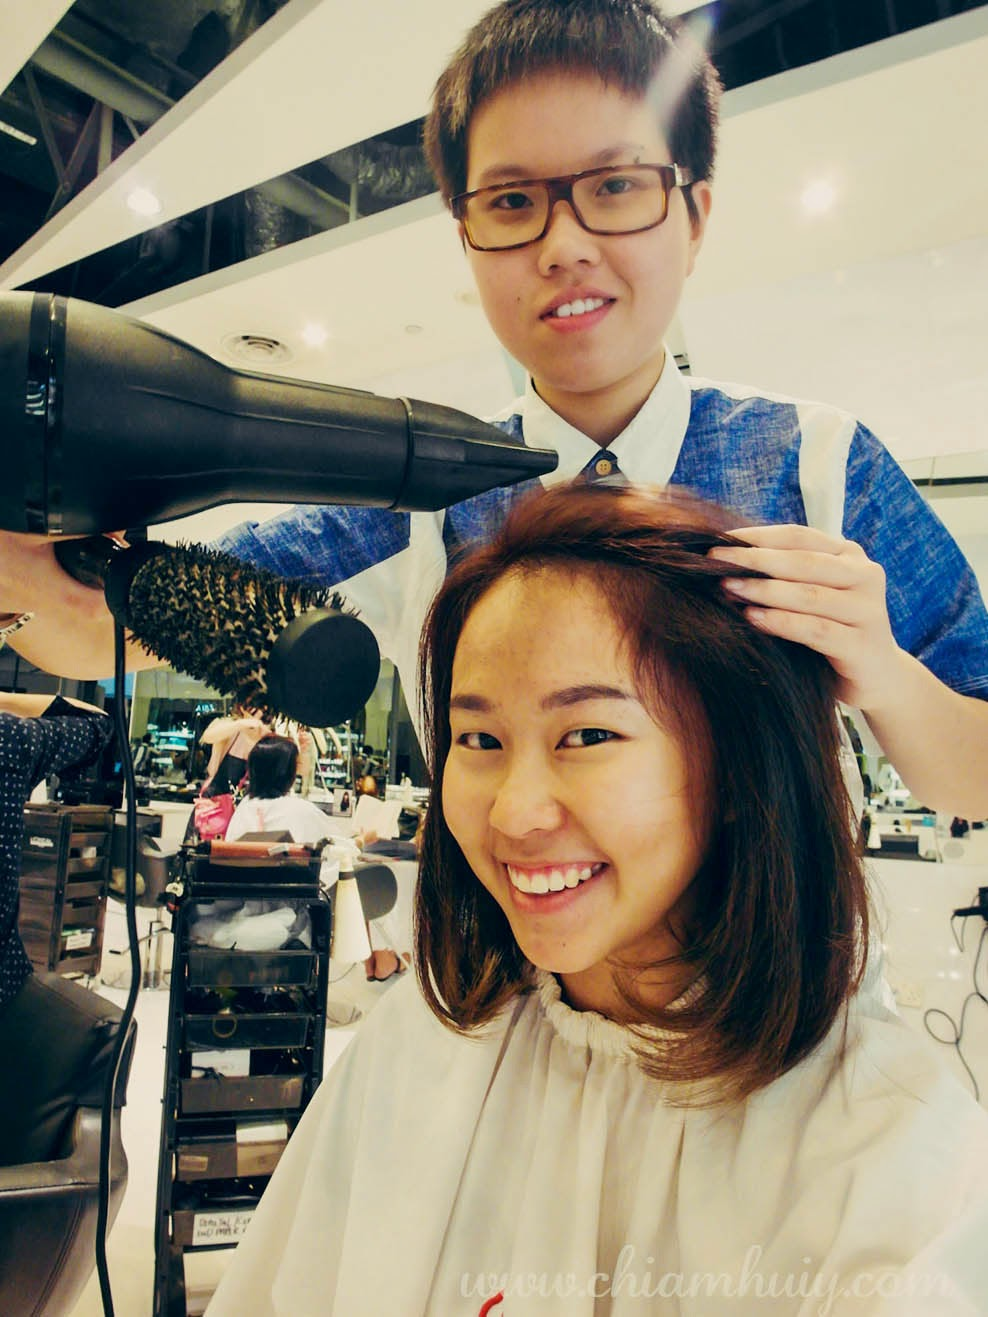 Pro Trim Hair Salon Singapore How To Save Damaged Hair Celine